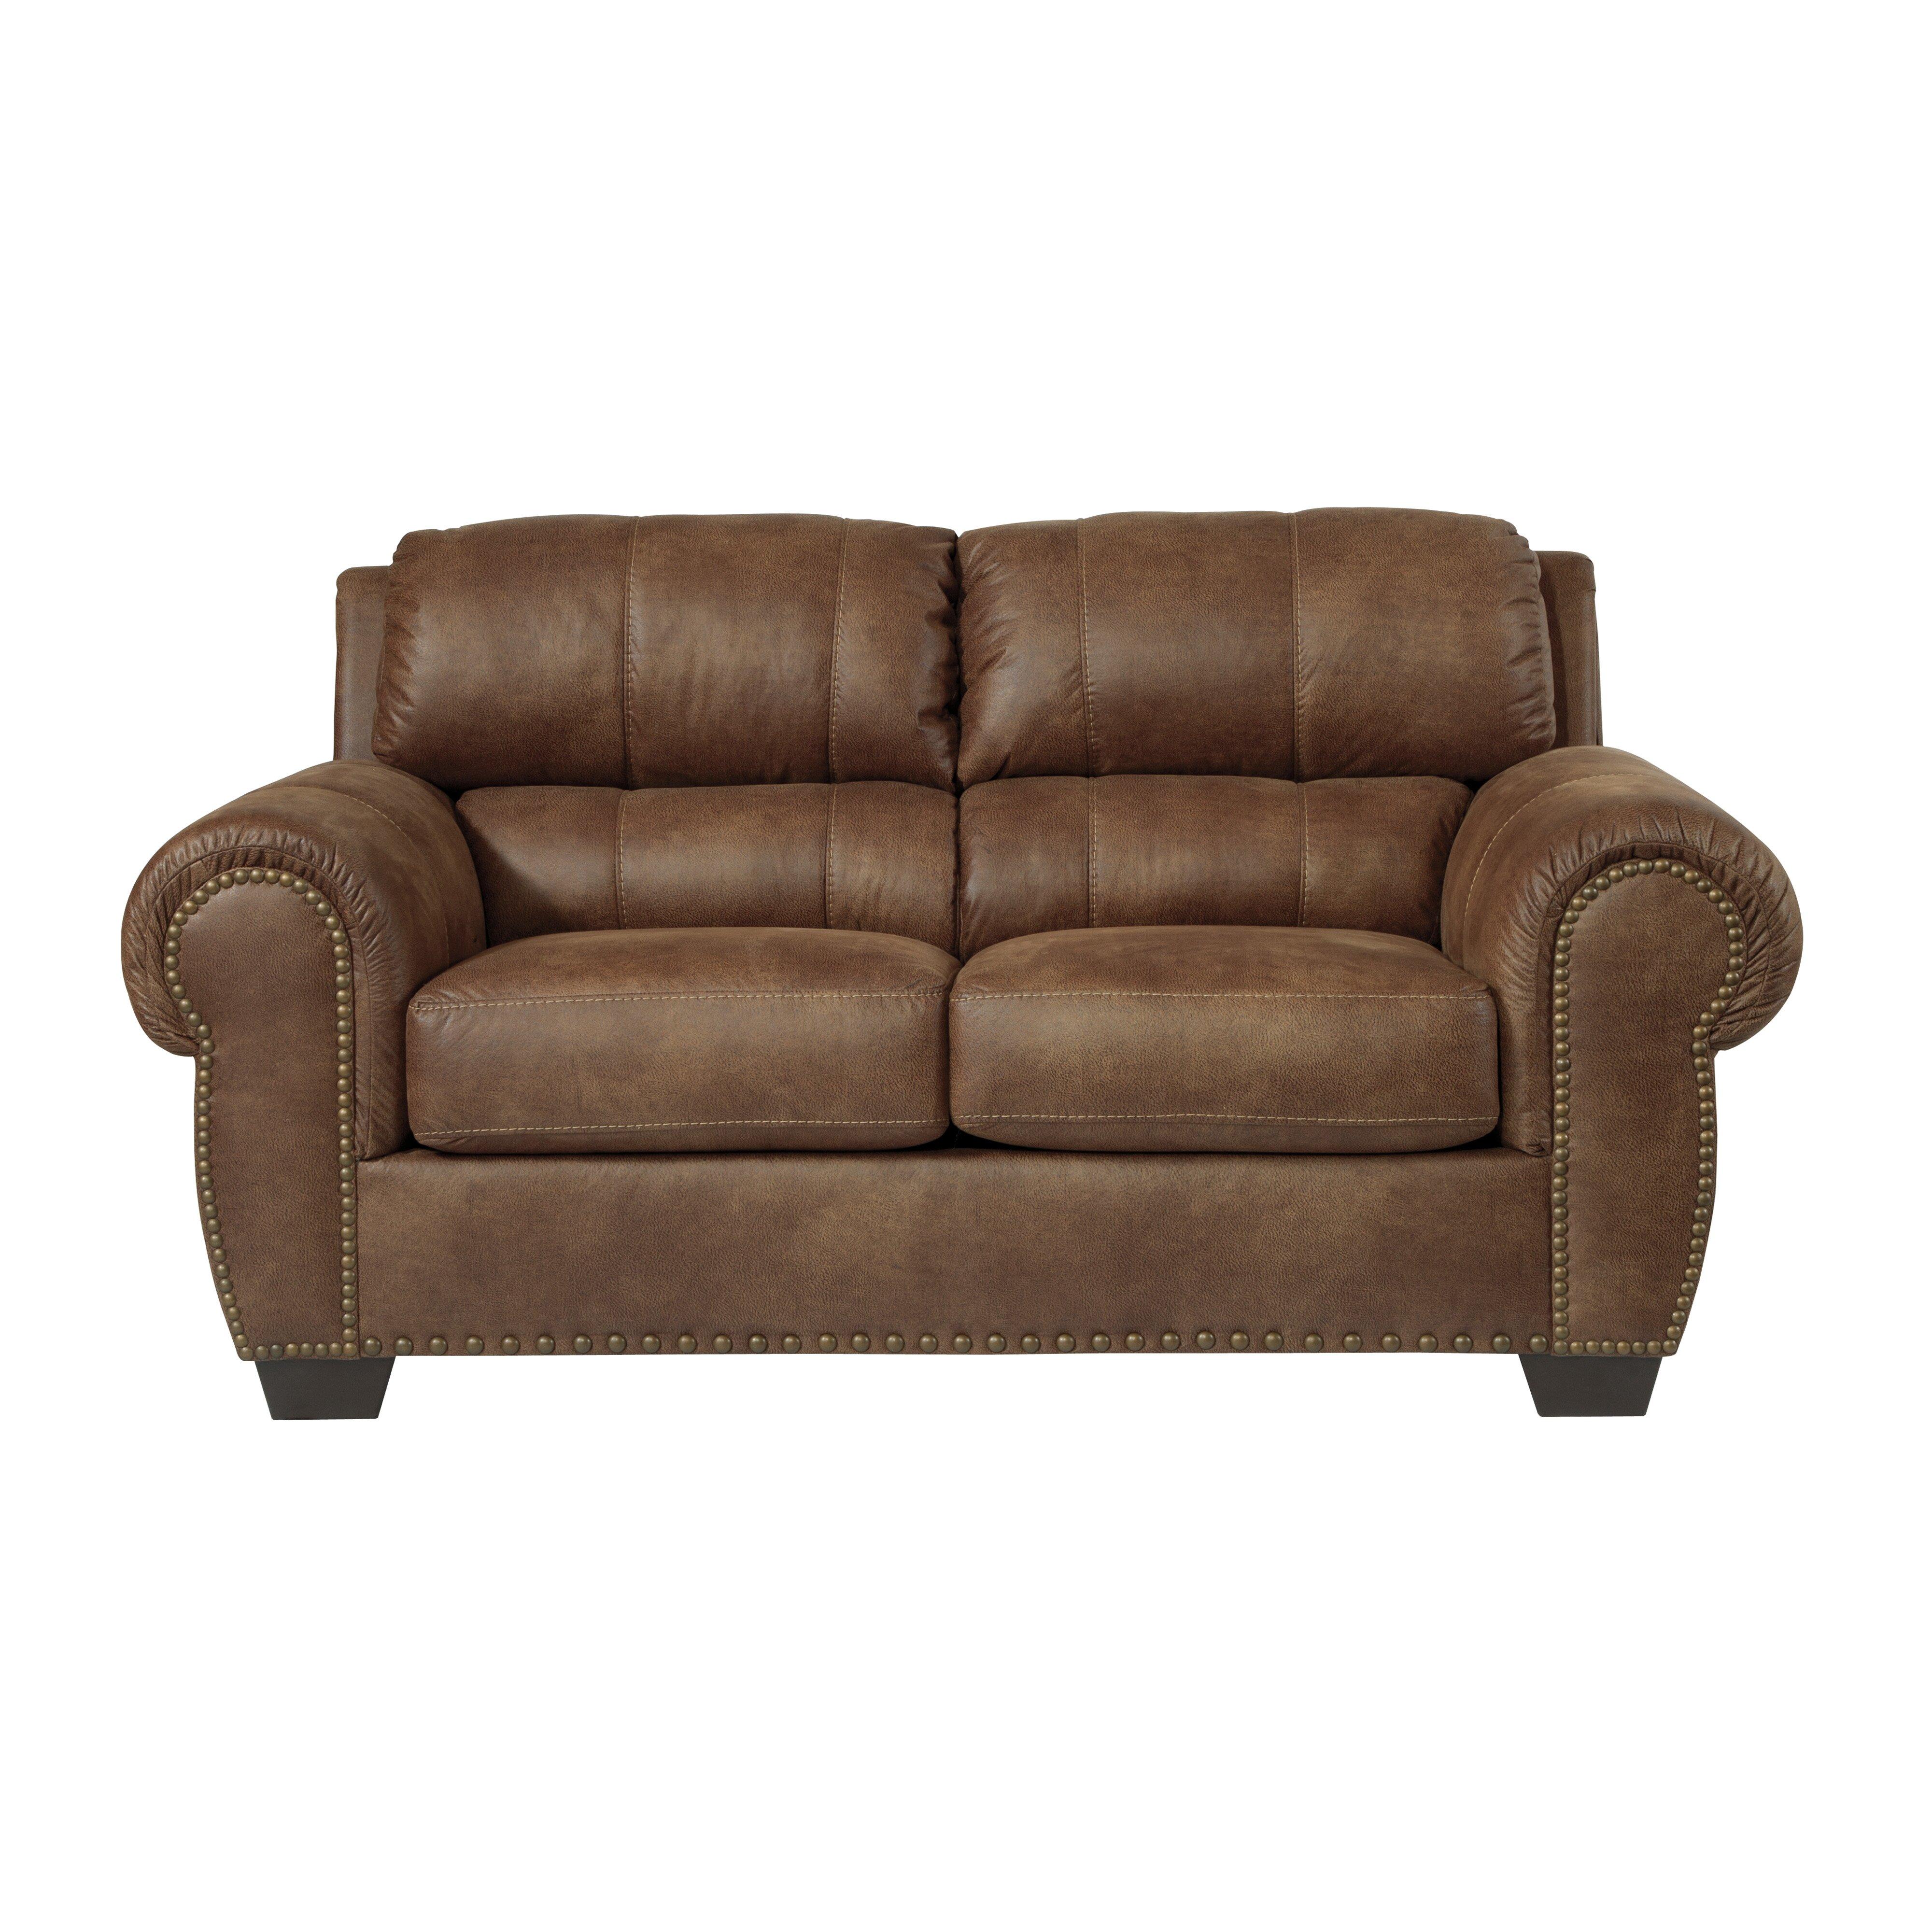 Benchcraft Burnsville Sleeper Living Room Collection Reviews Wayfair